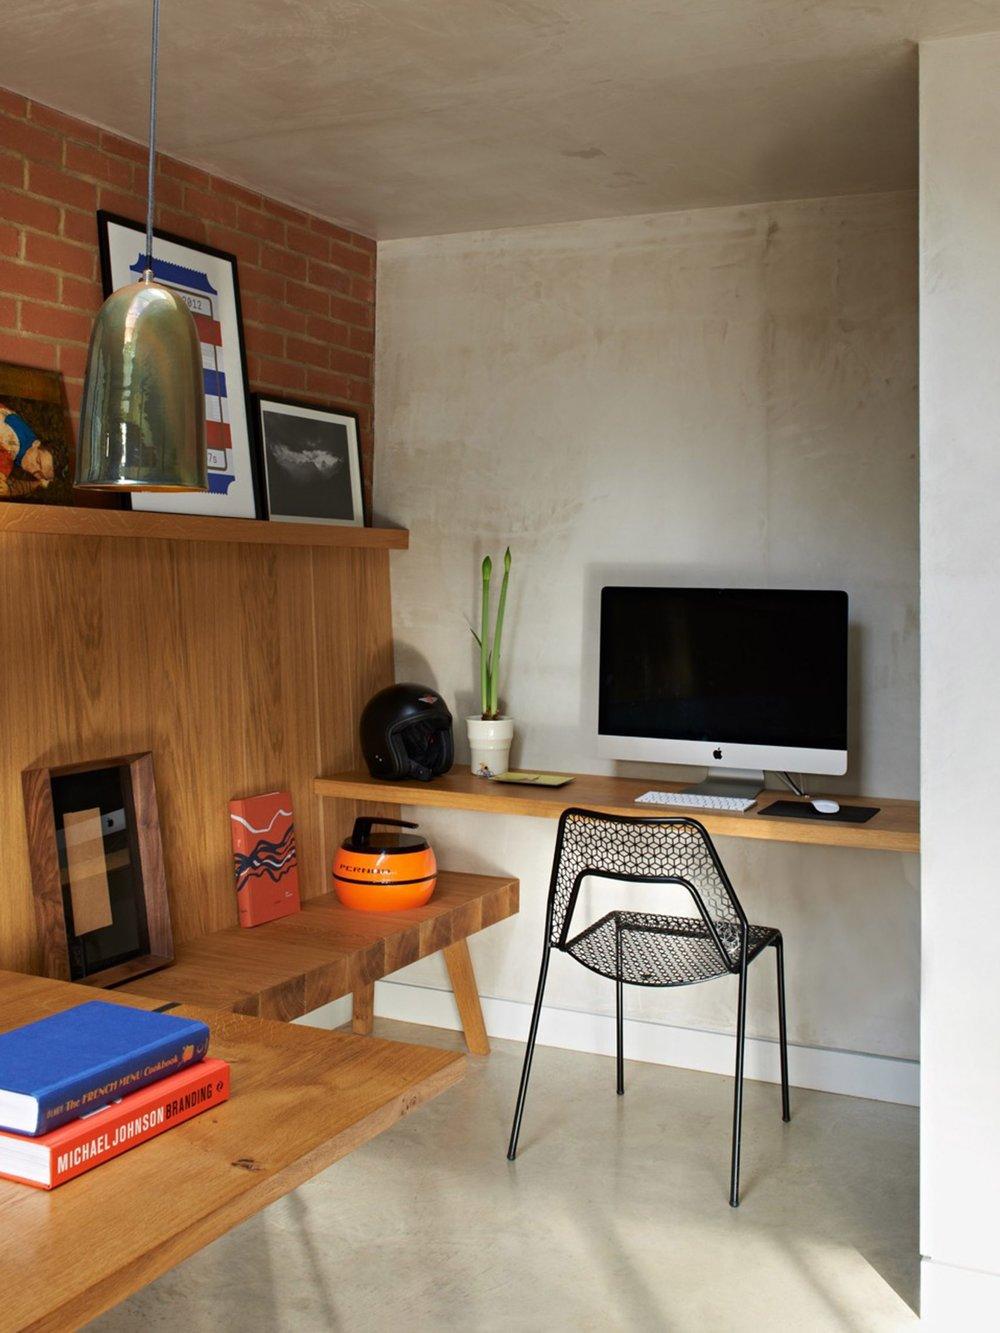 walm-lane-simon-mottram-house-interiors_dezeen_2364_col_3-1704x2272.jpg